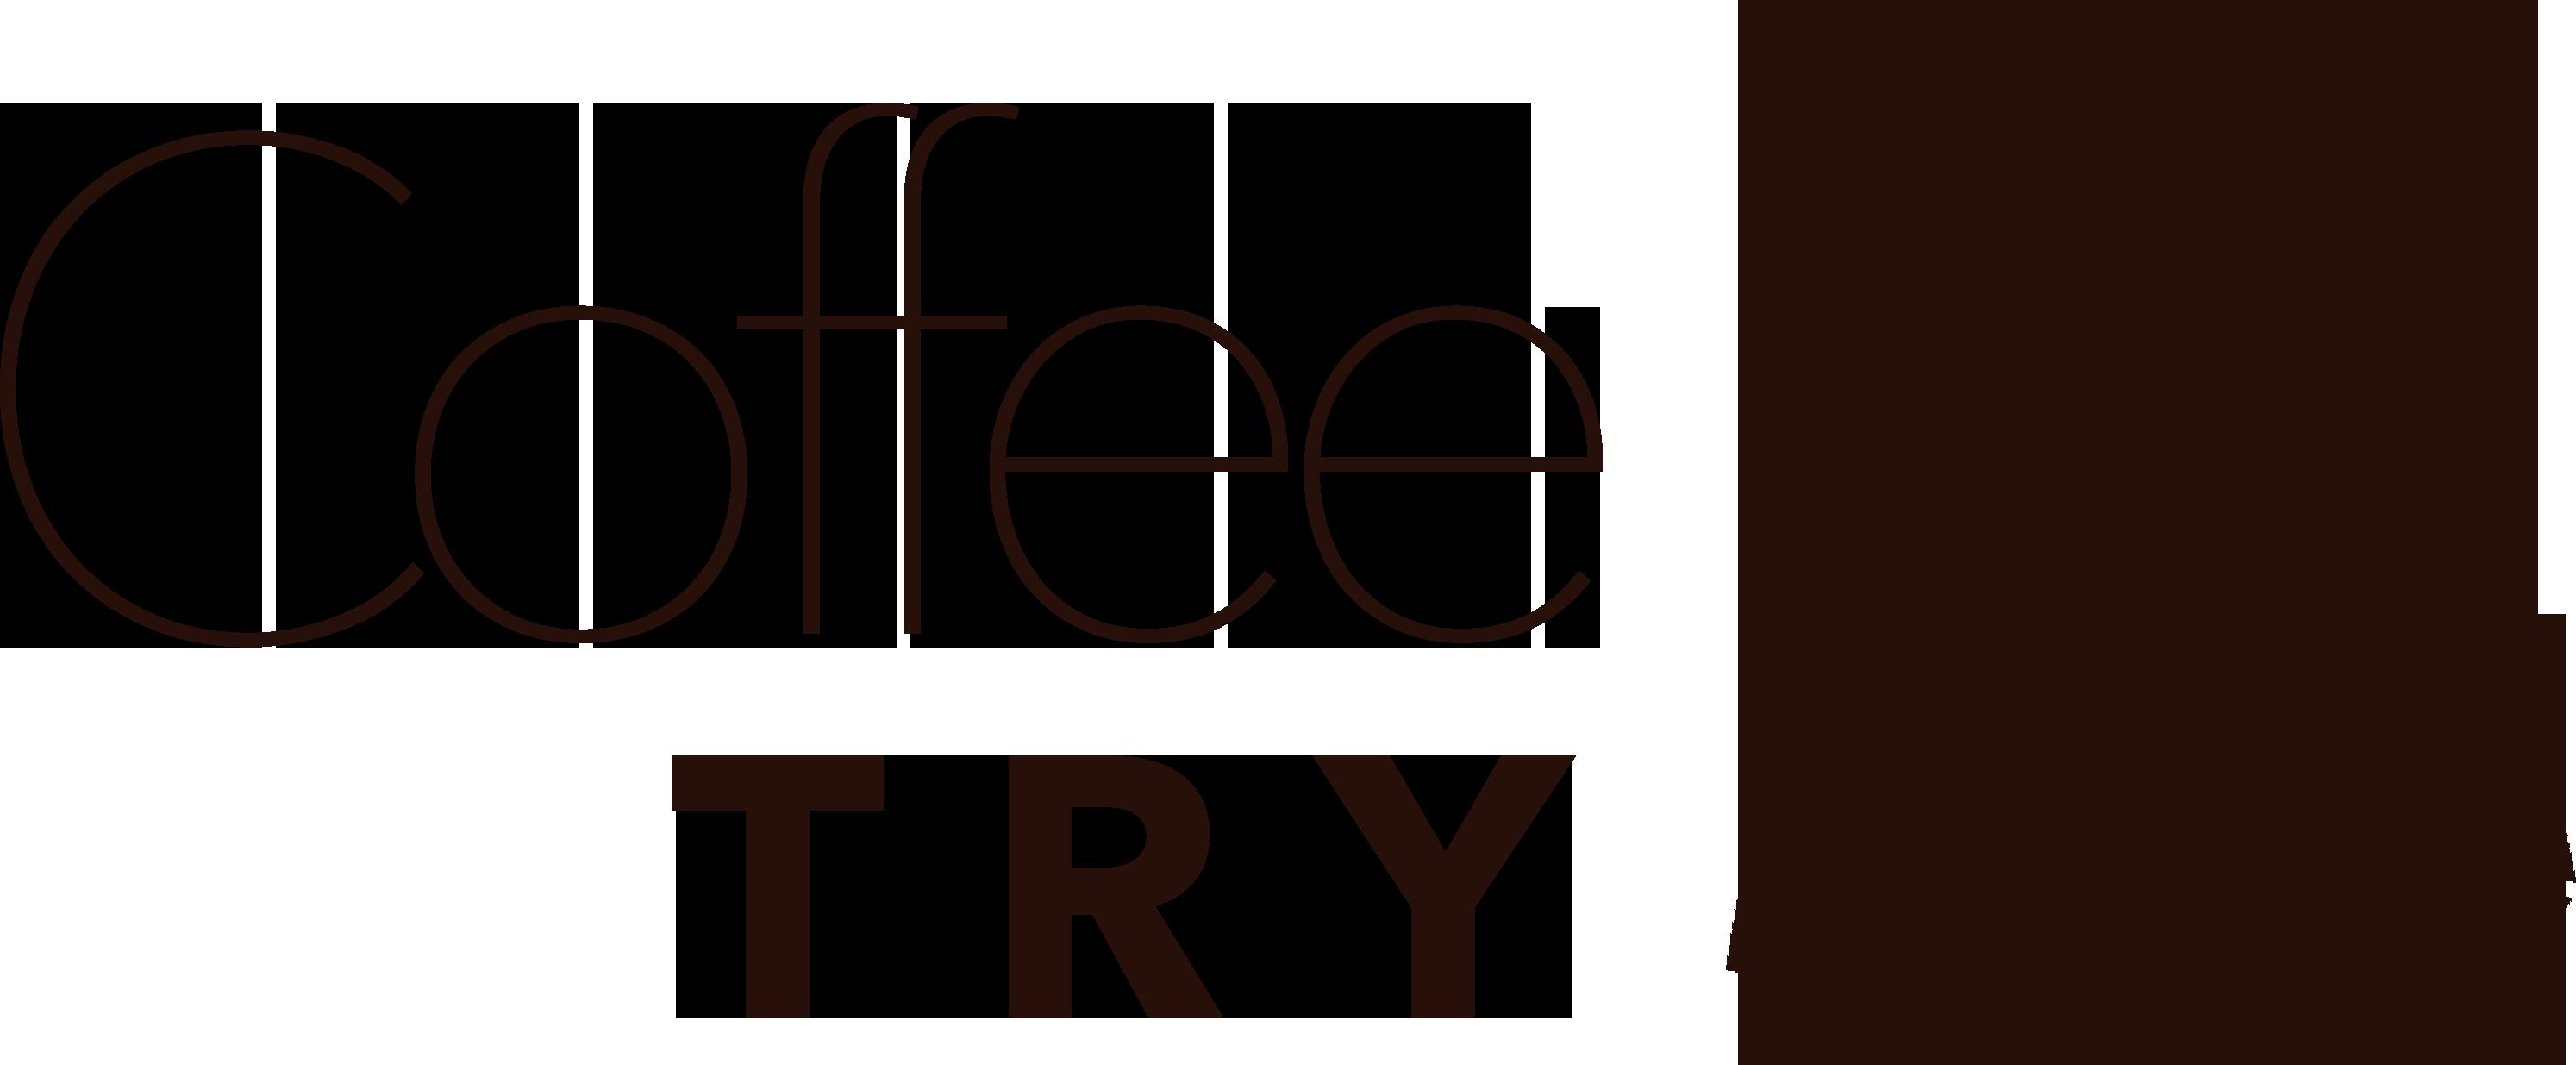 Coffeetry